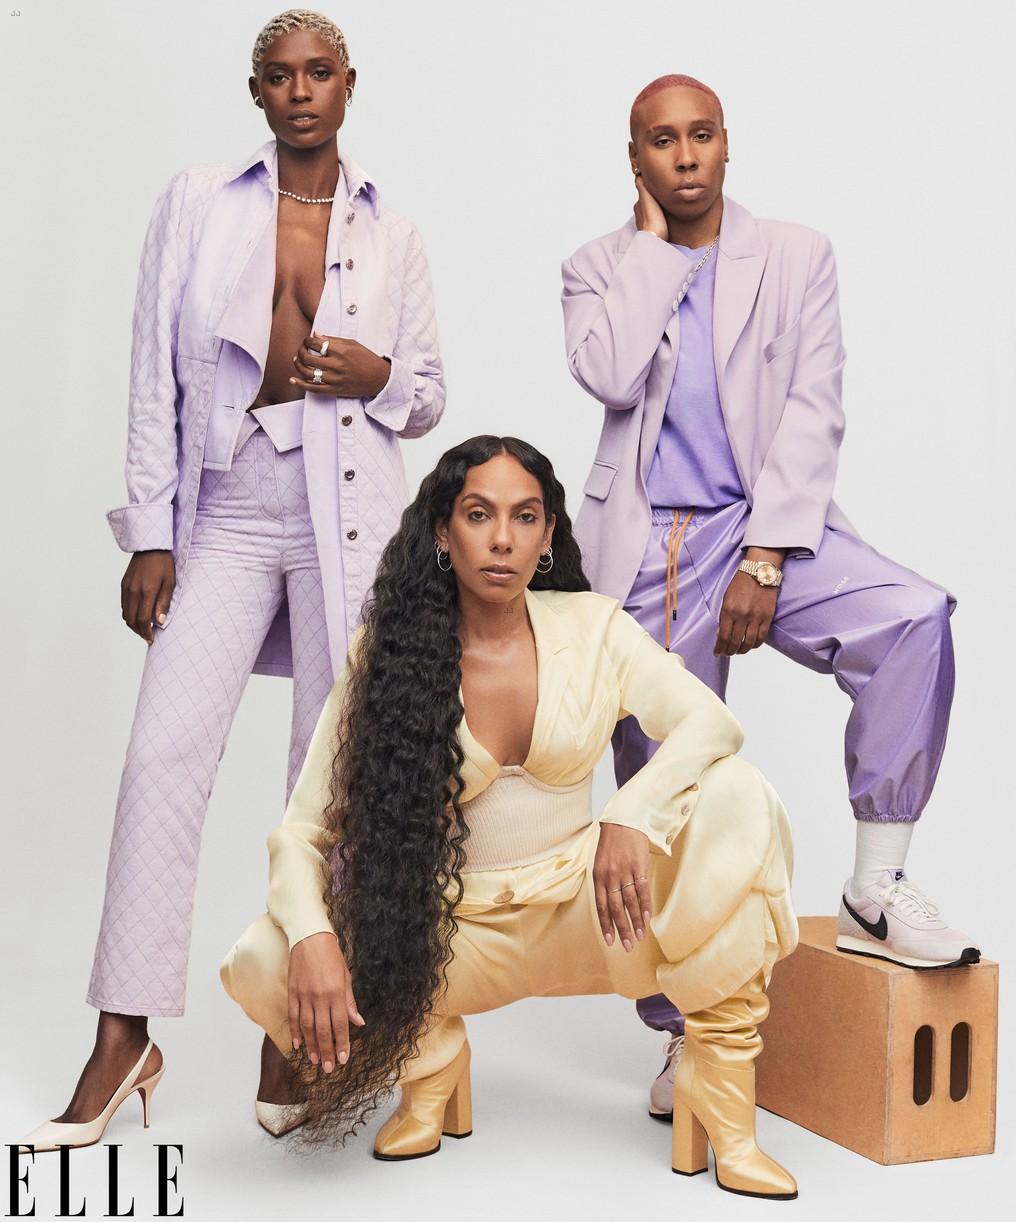 zendaya elle women hollywood issue queen slim 03